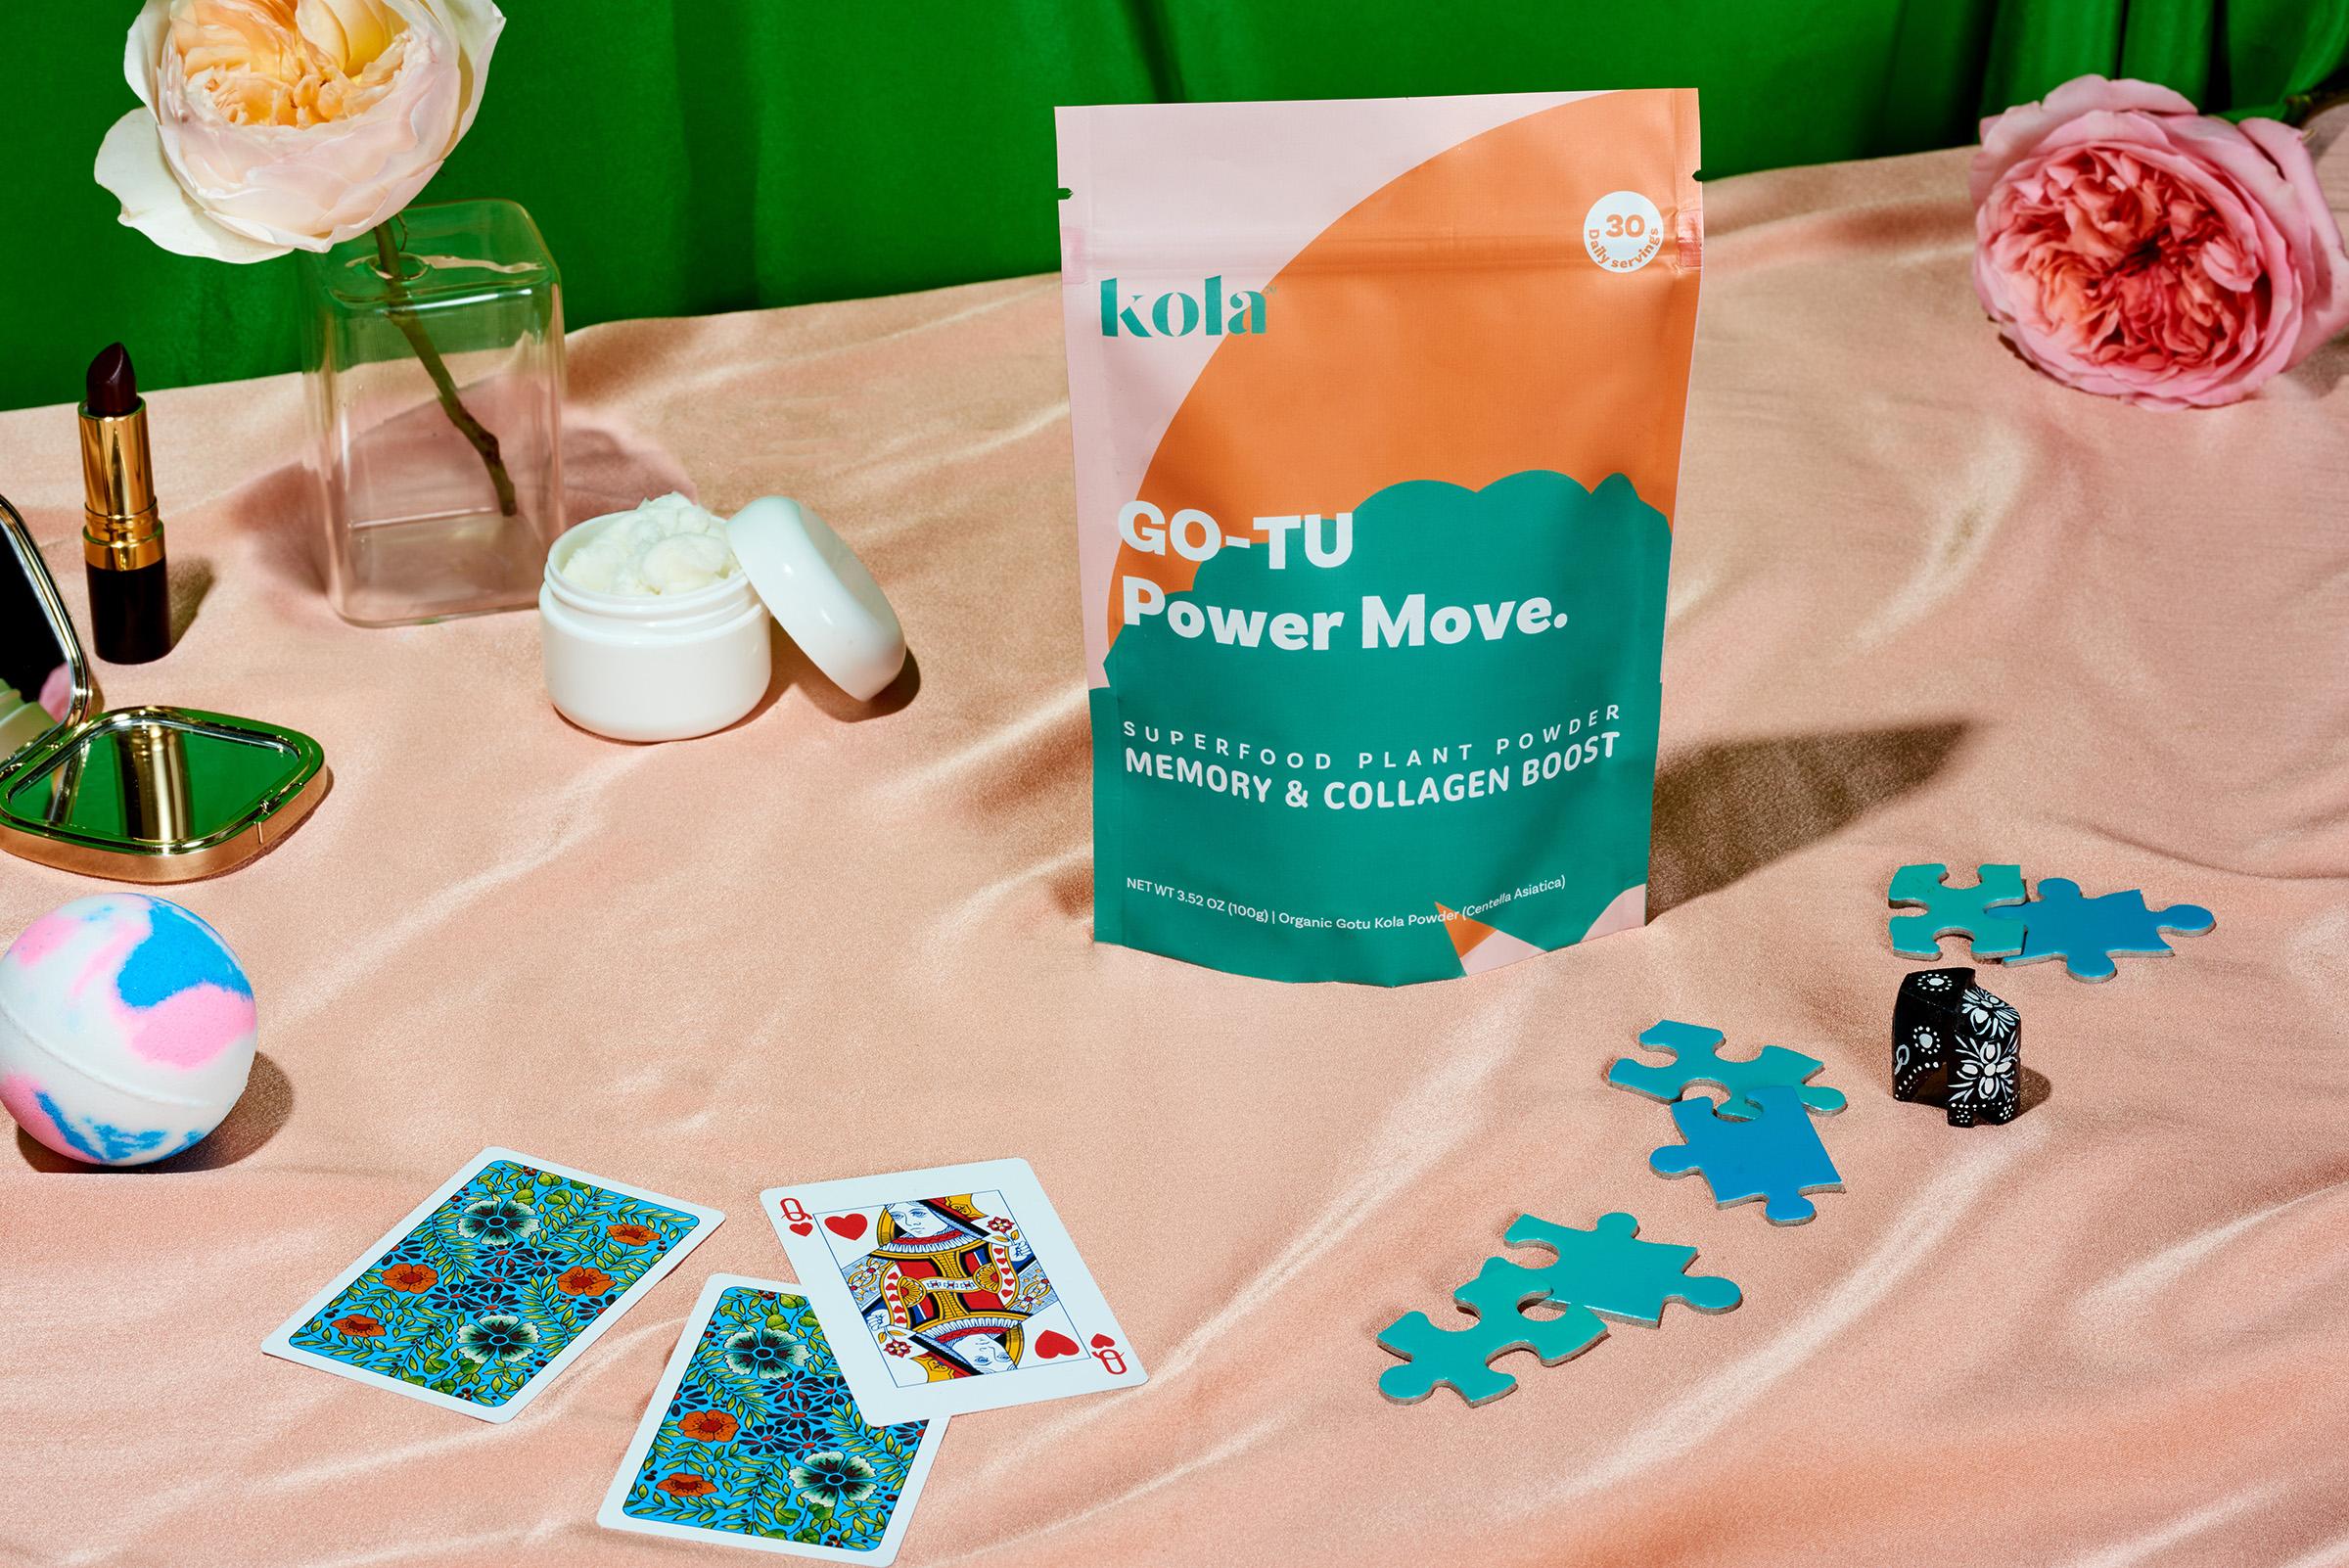 Kola — GO – TU Power Move SUP web